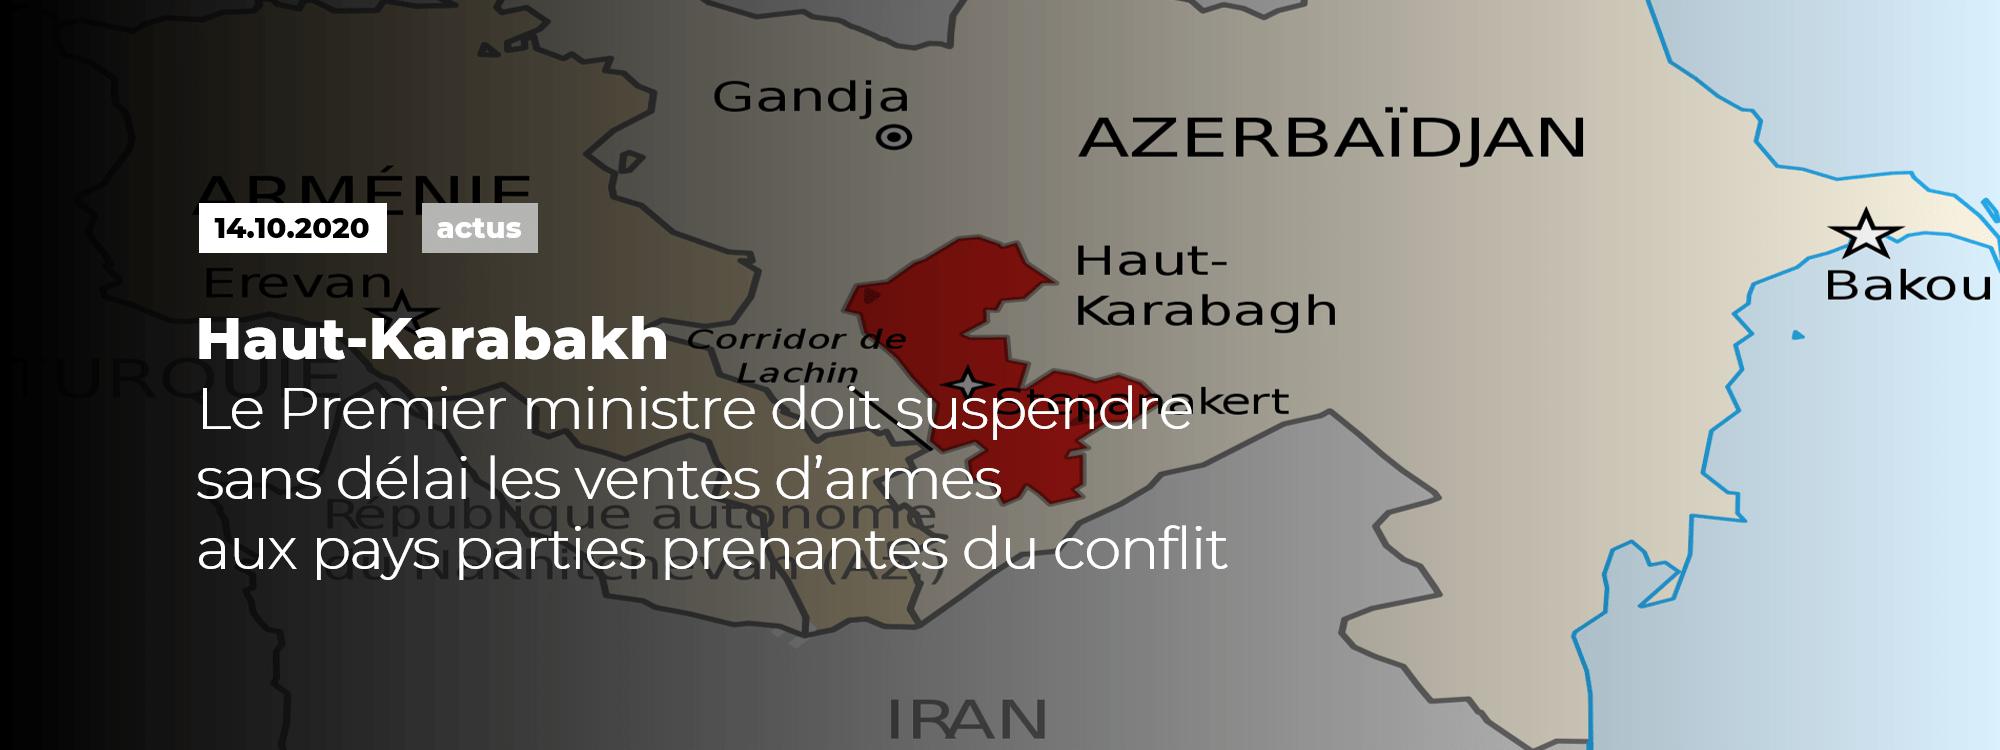 2014014_bannière Haut-Karabakh